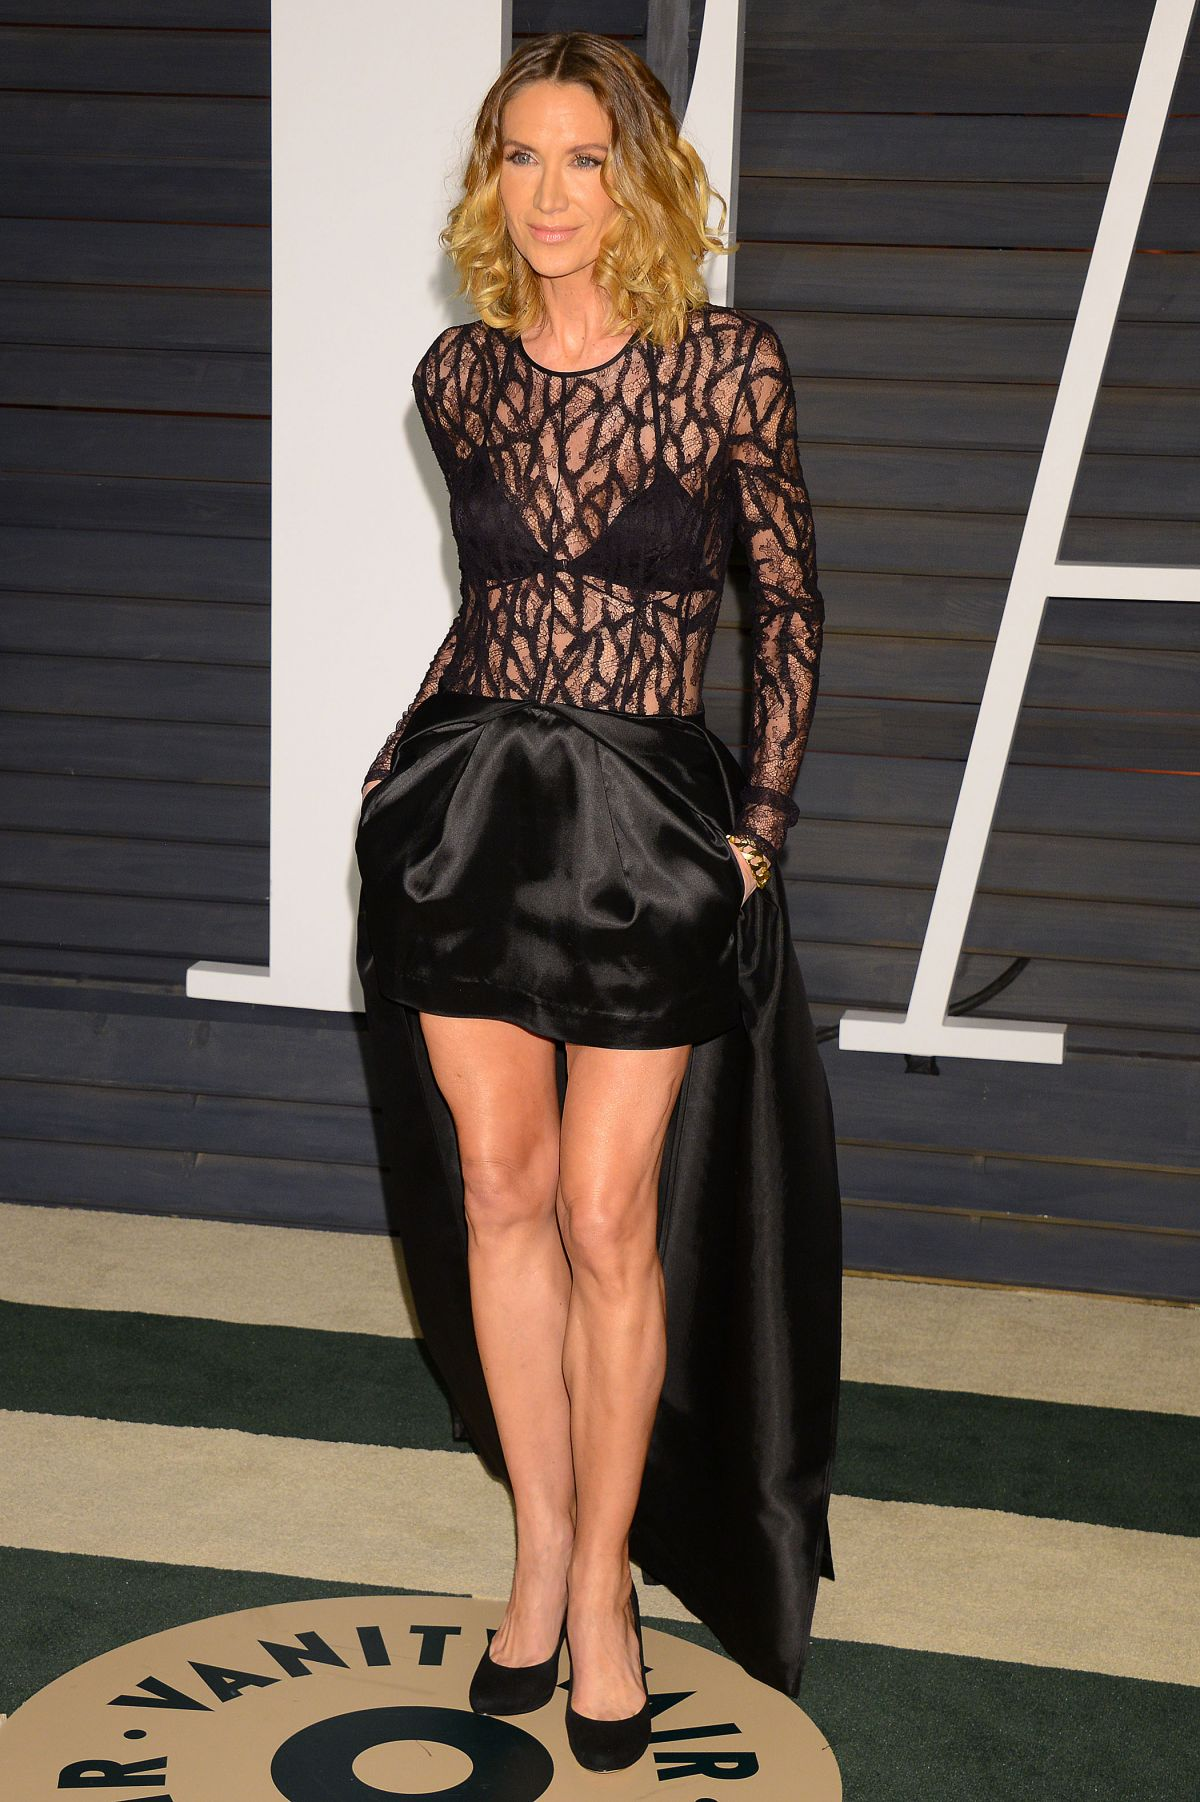 Amy Adamss Changing Looks  InStylecom